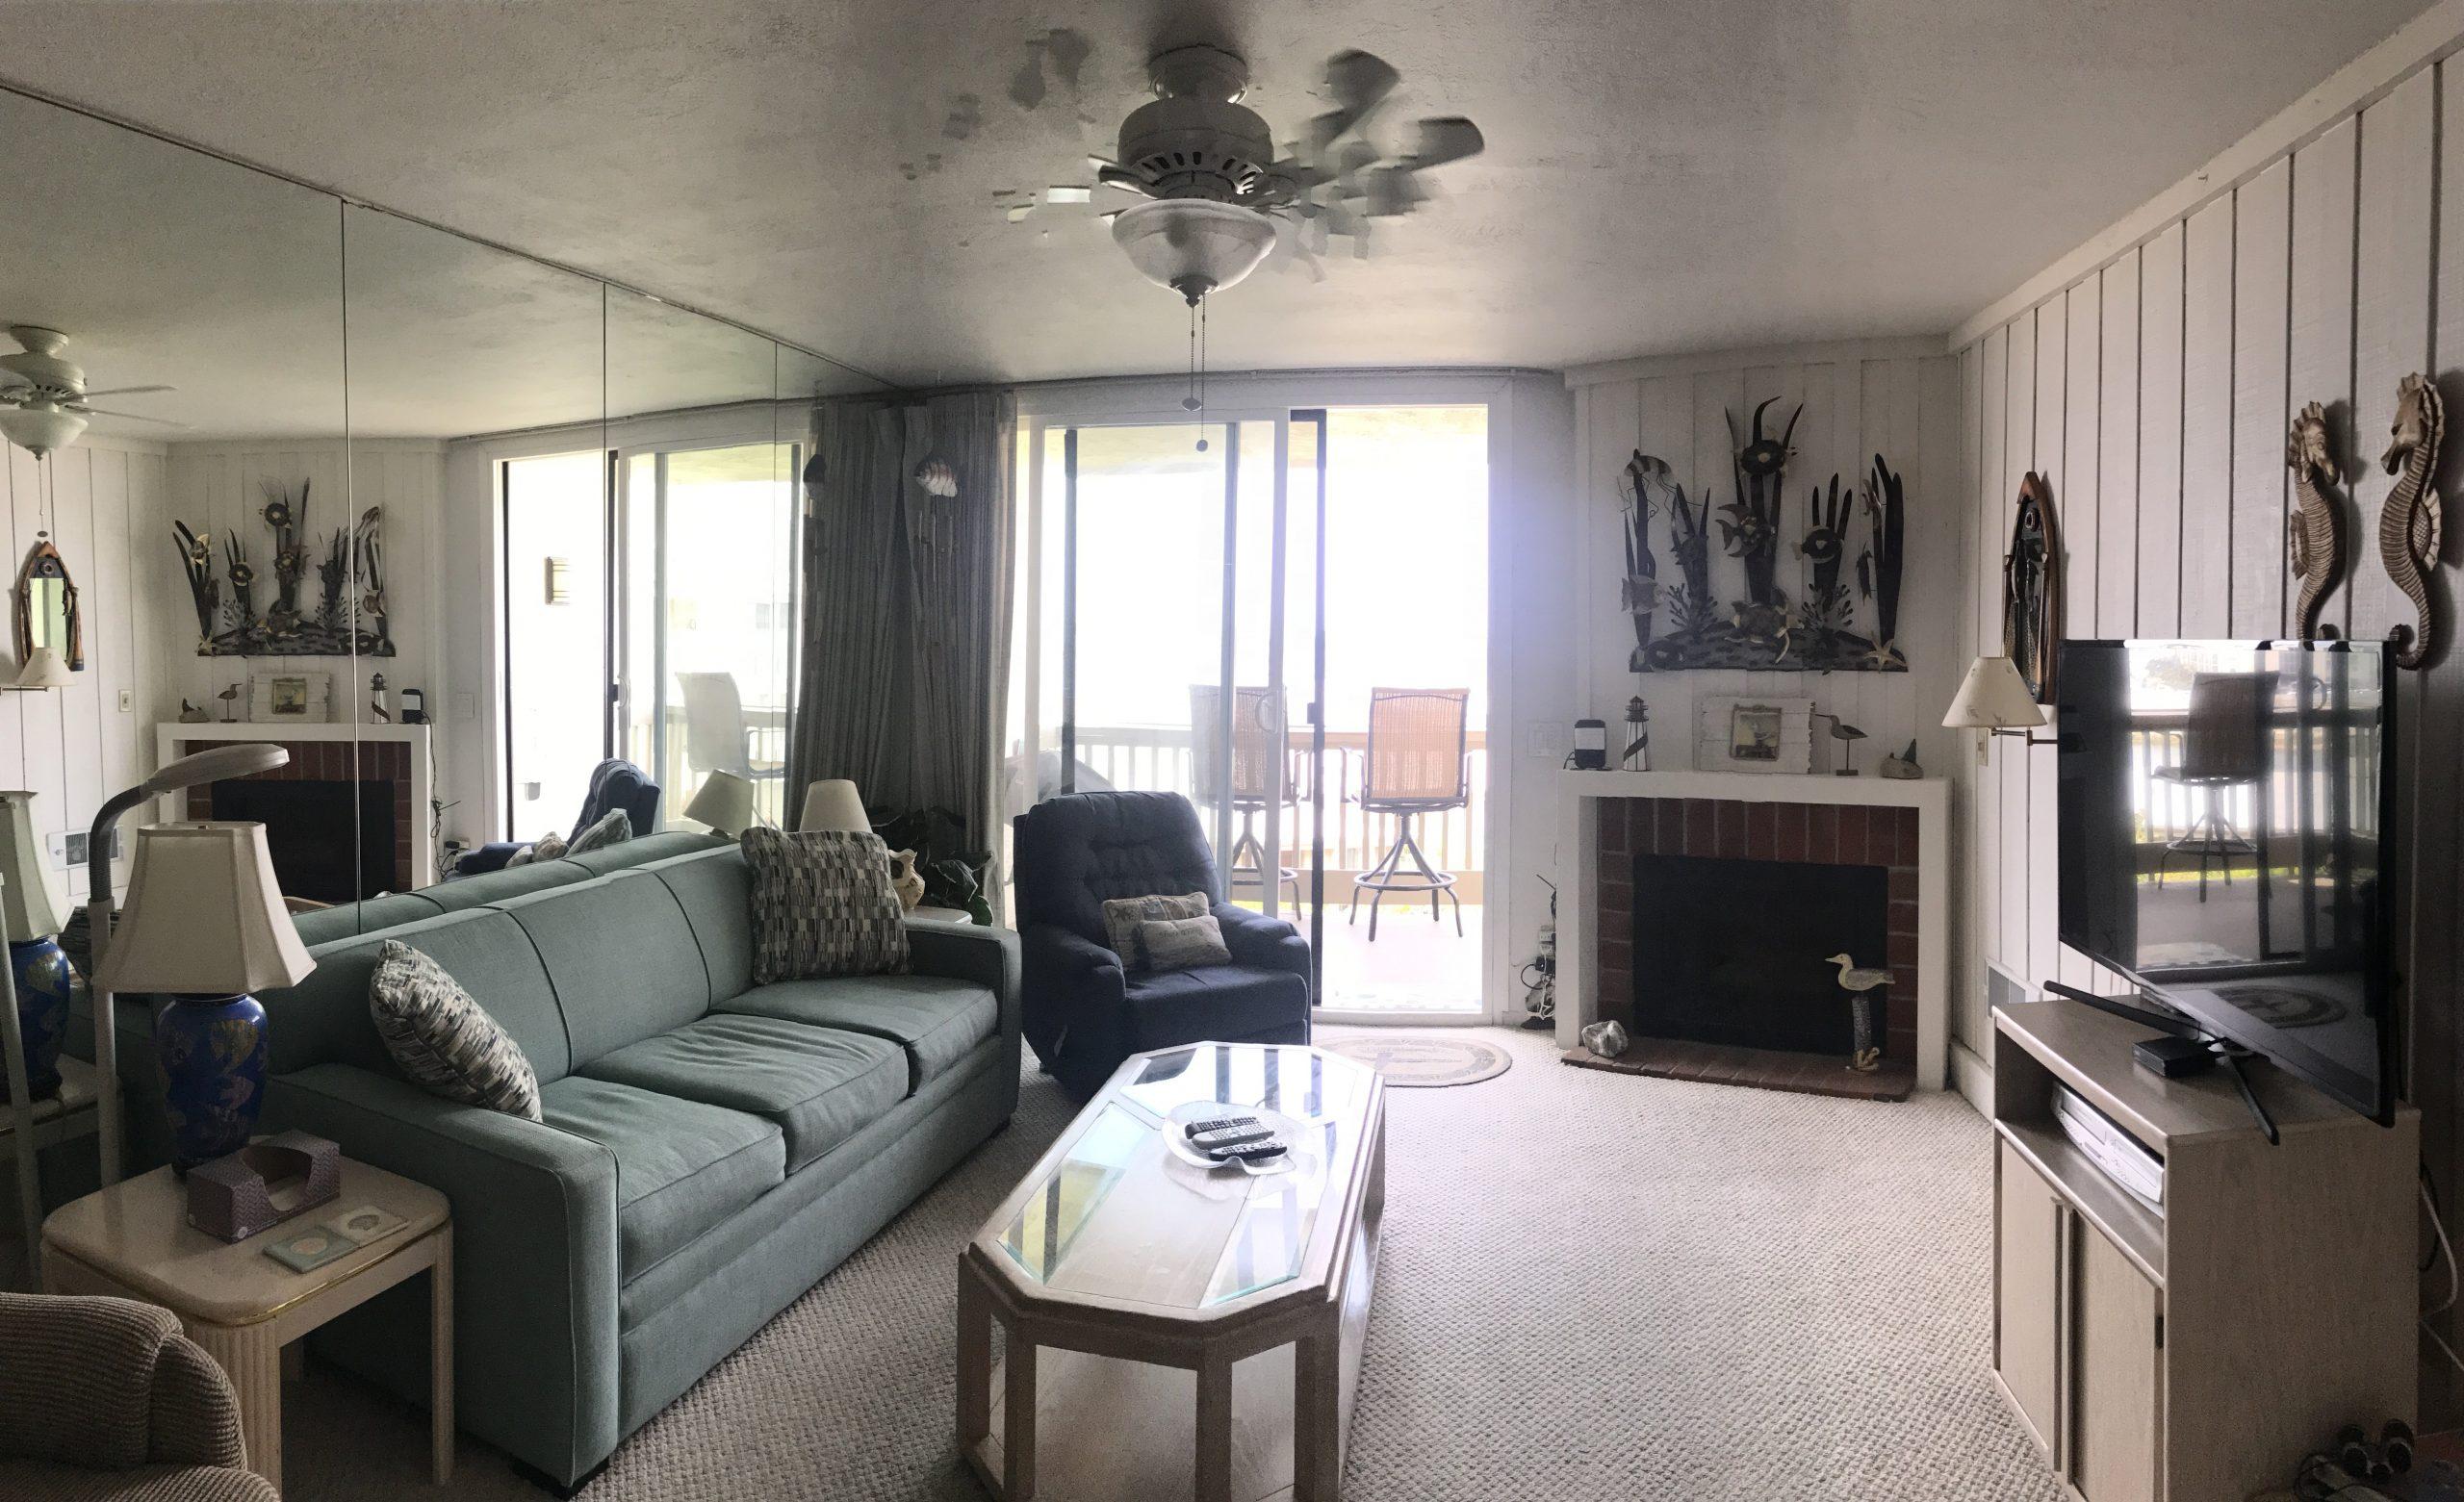 G-219 One Bedroom Rental